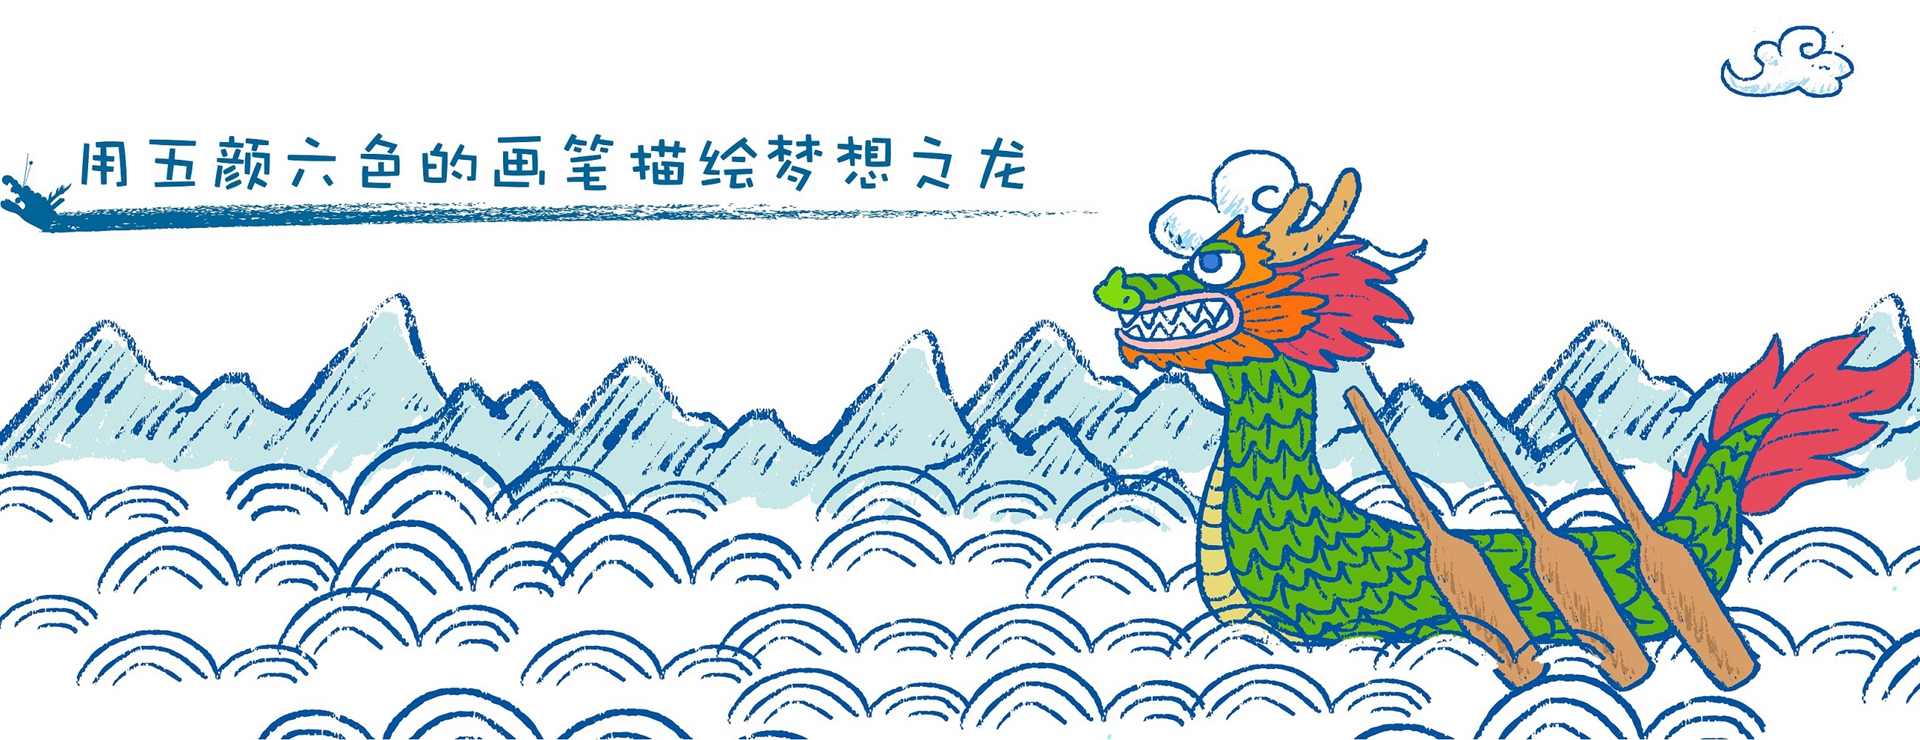 文化教育-banner